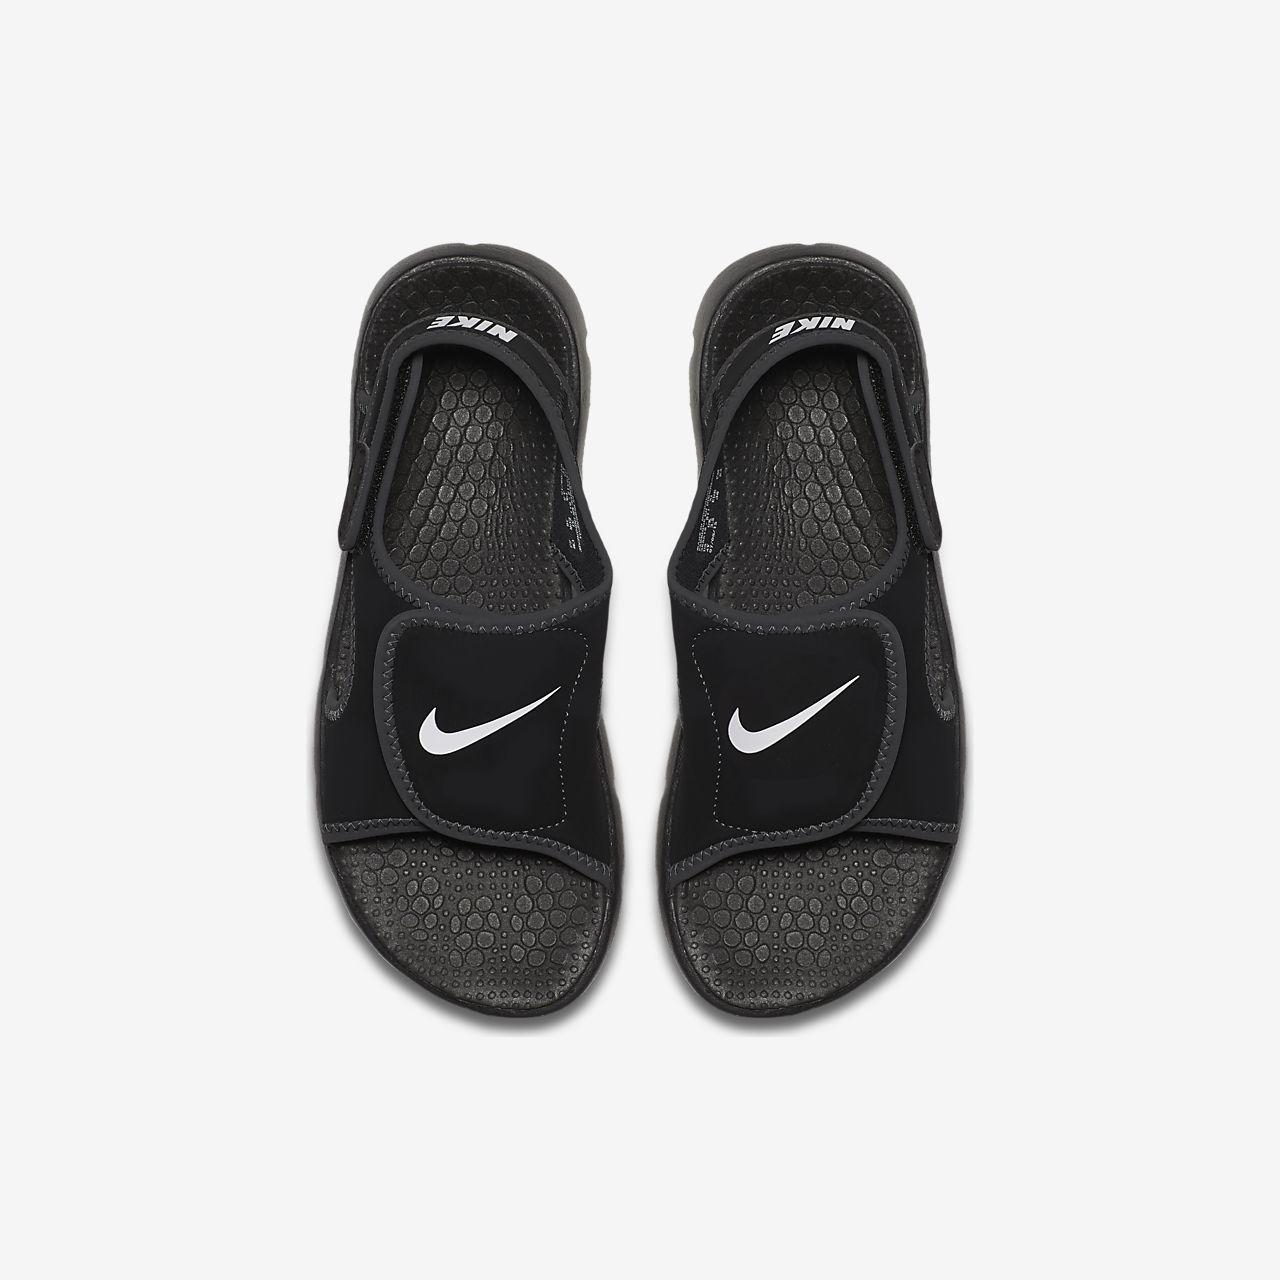 Nike Sunray Adjust 4 Jungenschuh - Schwarz rF7Kv